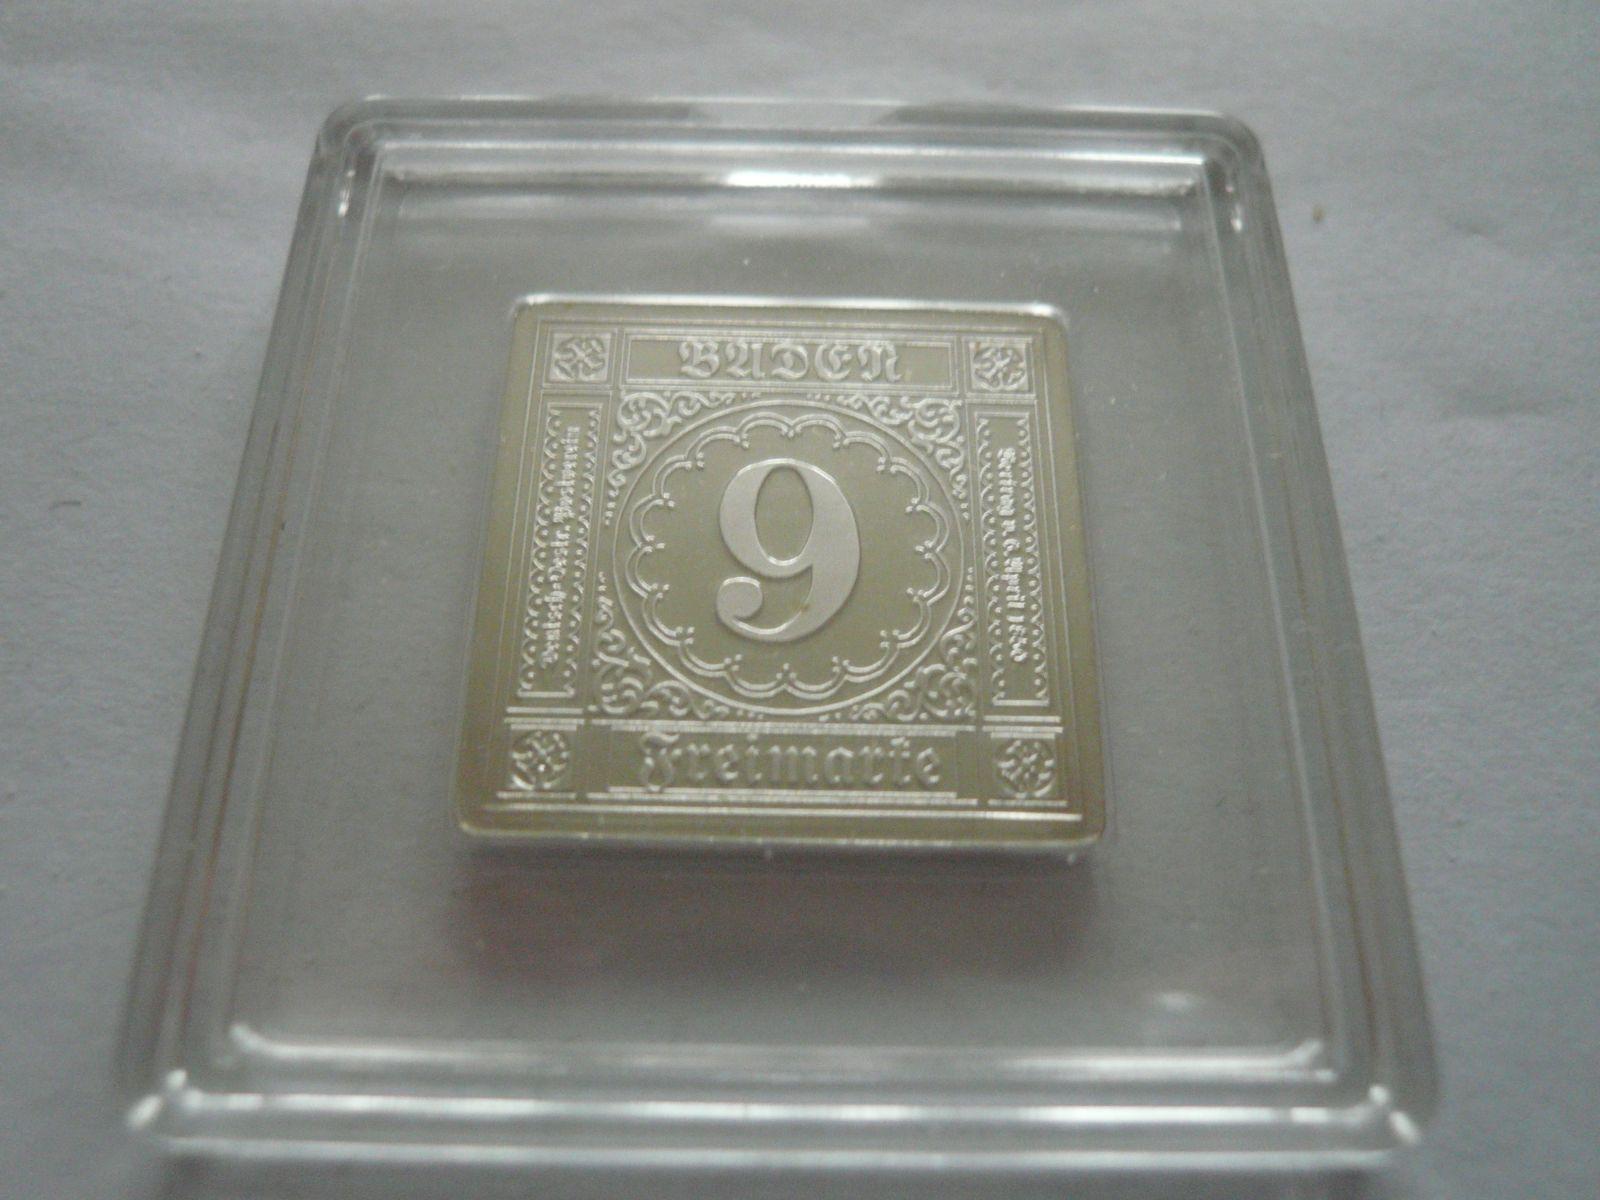 9 Krejcar 1851, 999/1000 Baden Schweiz